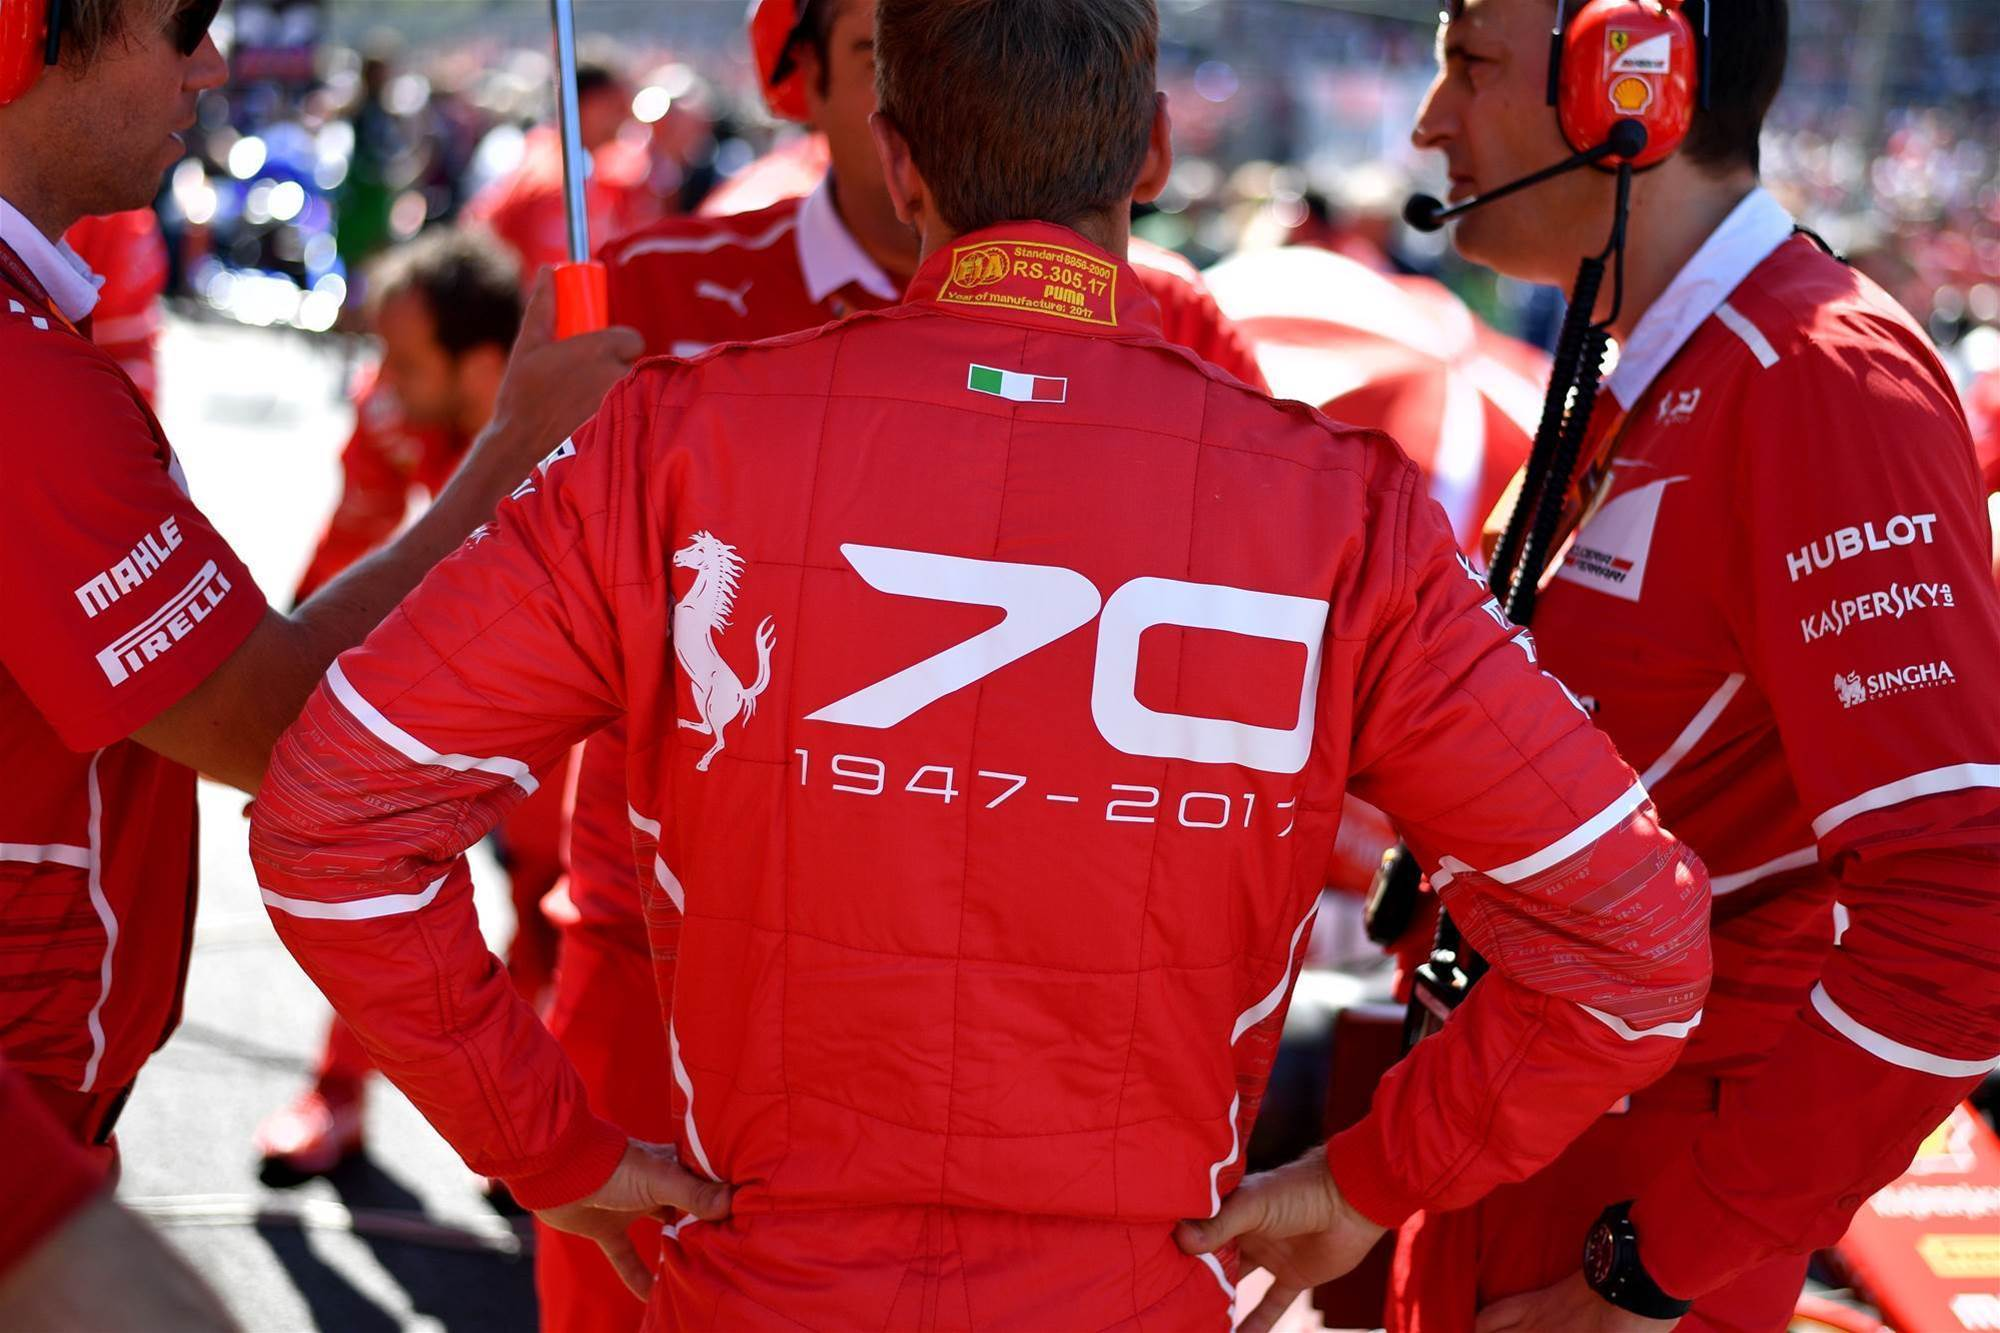 We screwed up: Ferrari boss